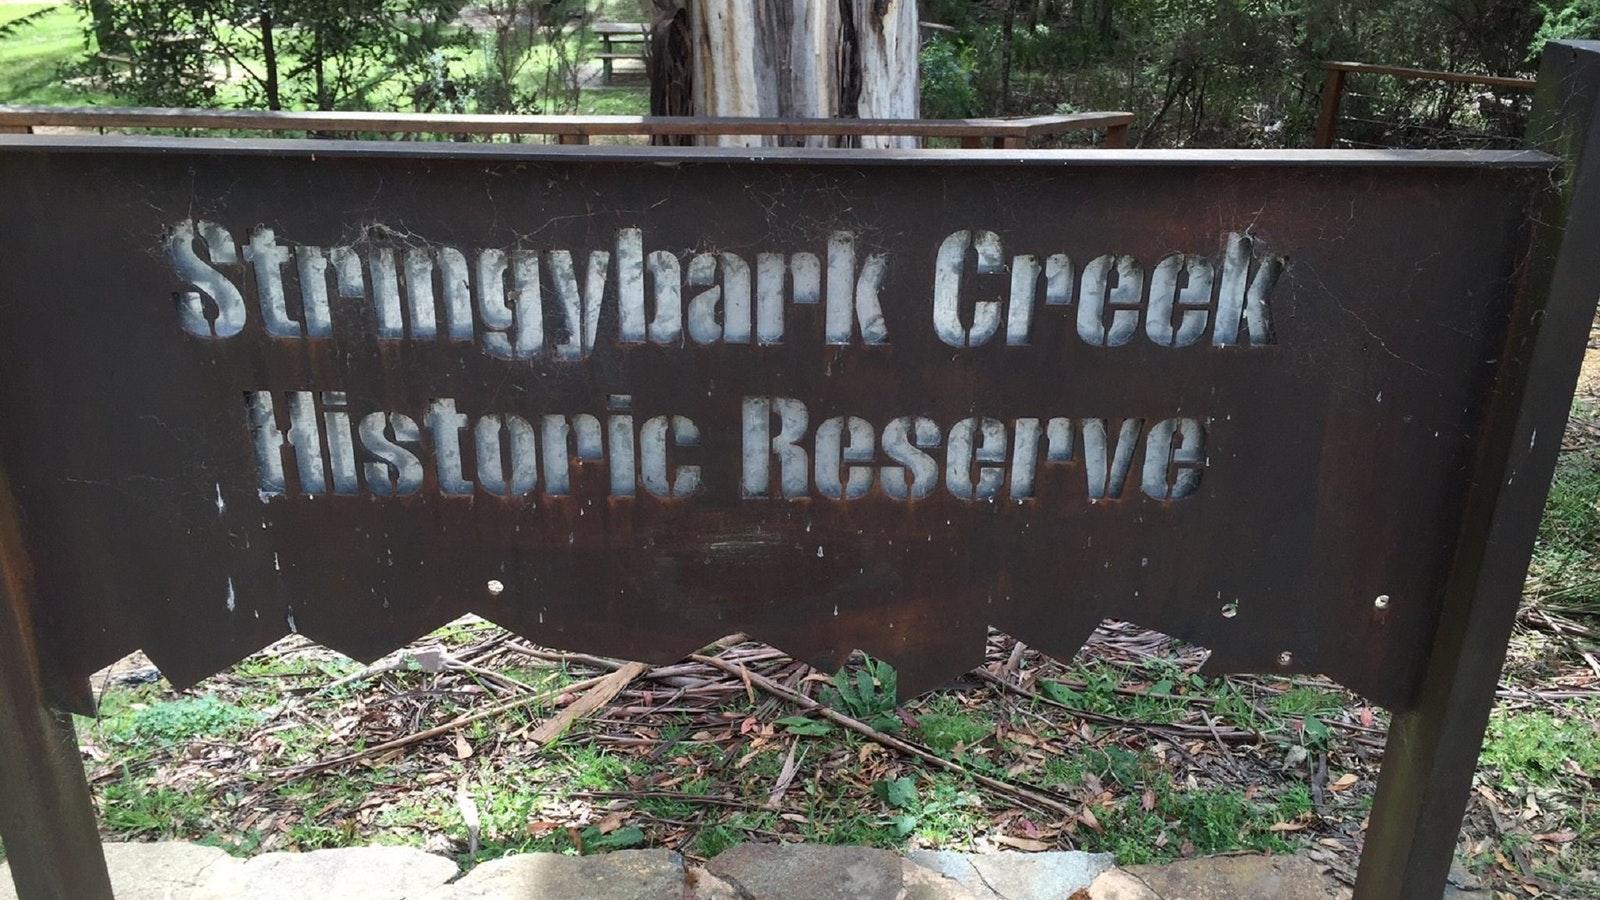 Stringybark Creek Historic Reserve